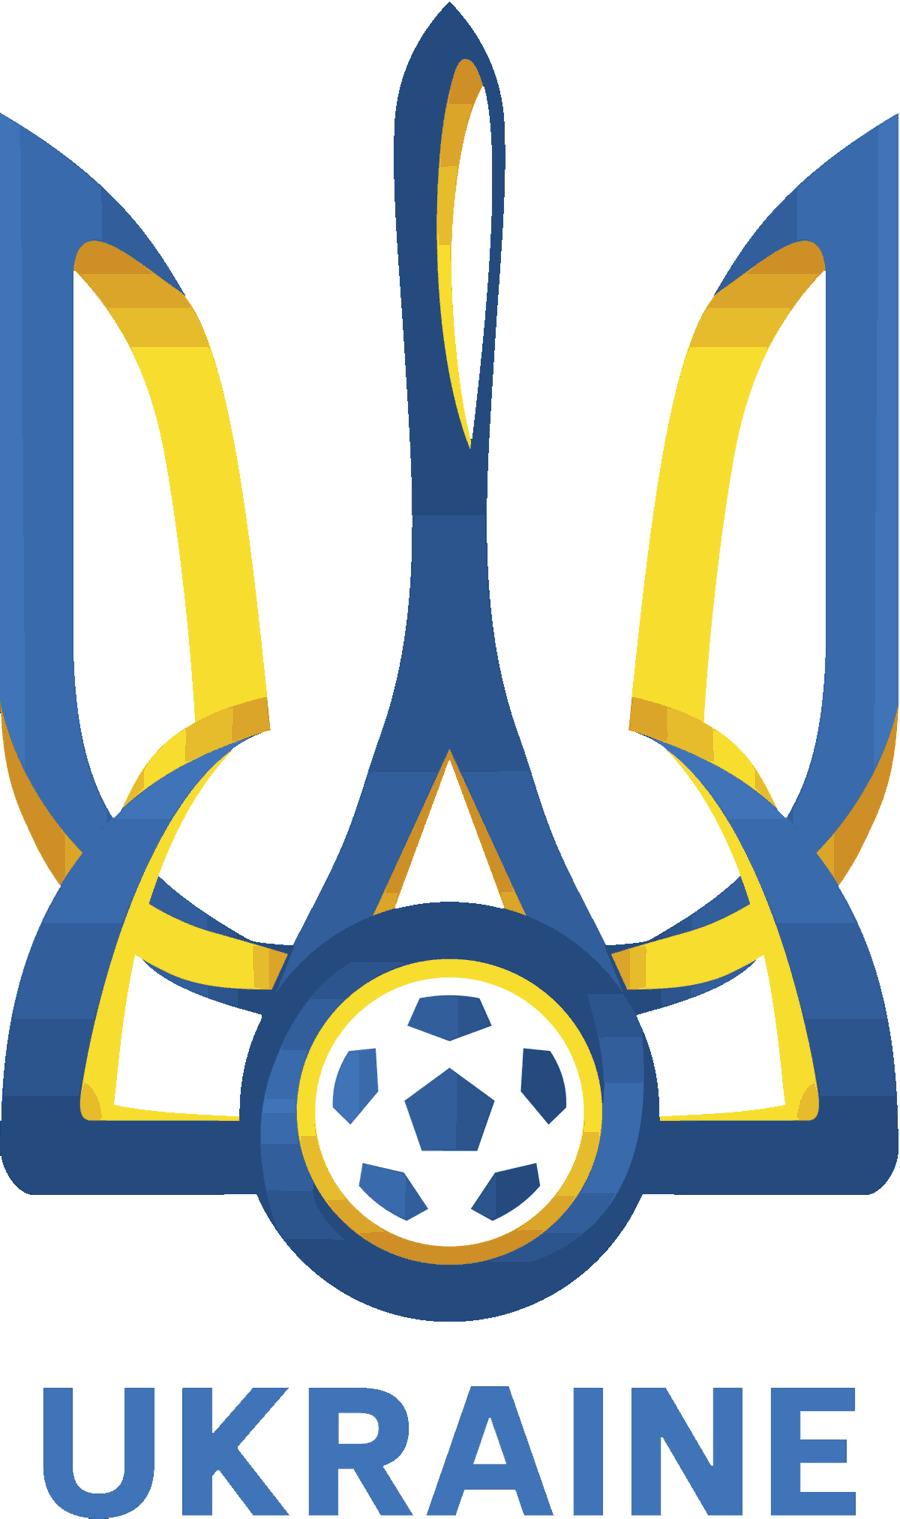 Ucraina - Ukrainian Premyer Liga